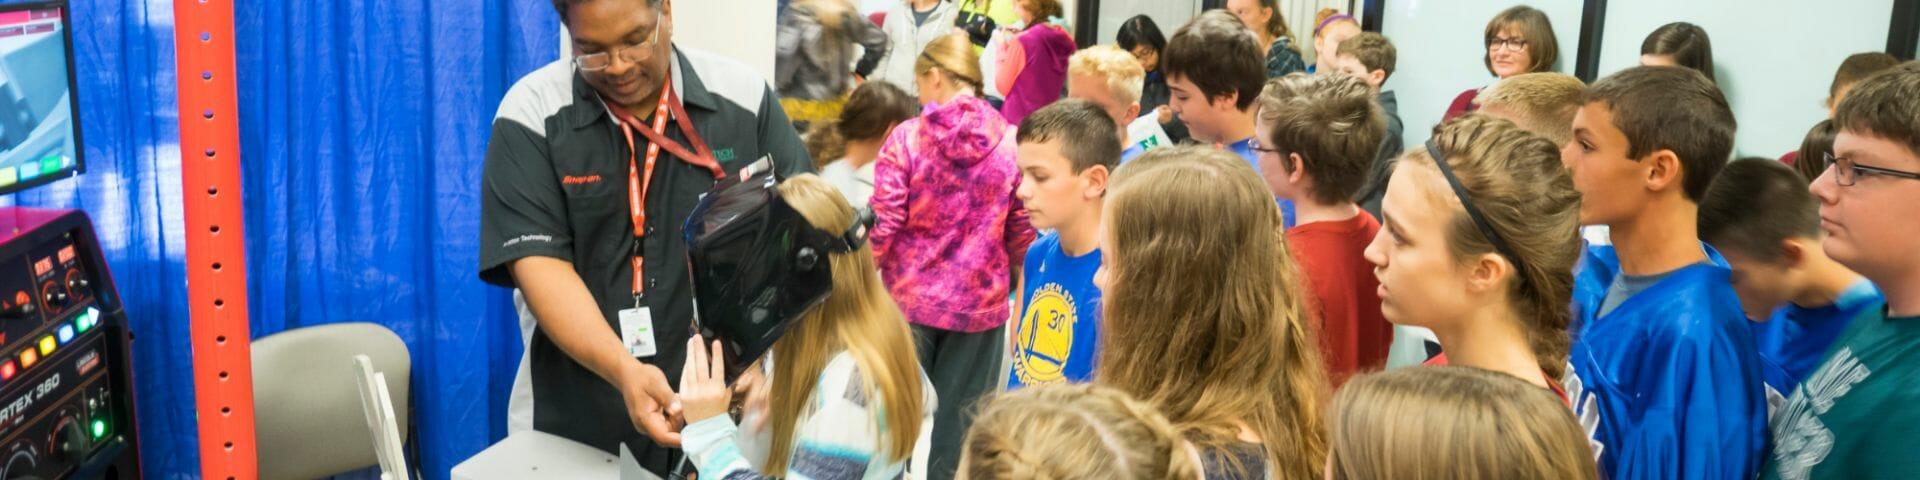 K-12 Initiatives